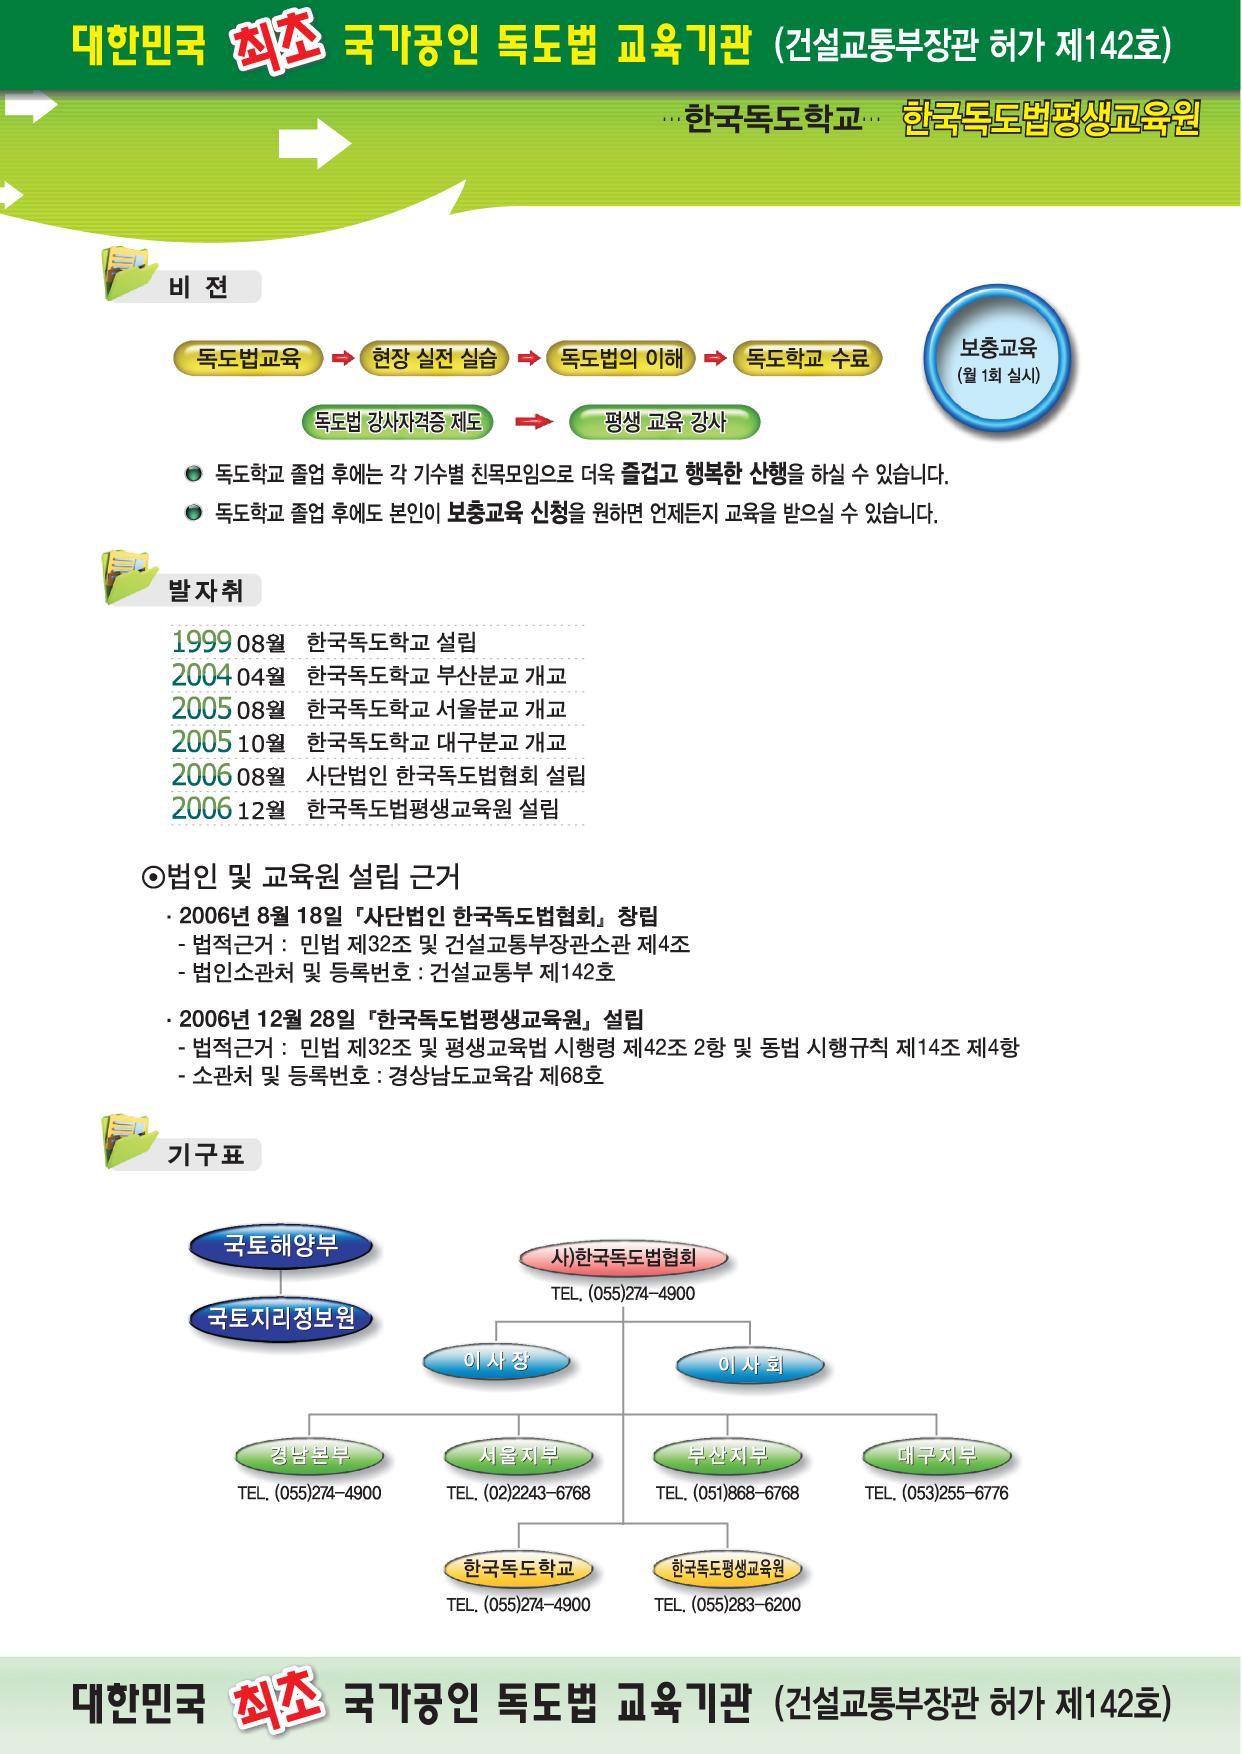 information2.jpg